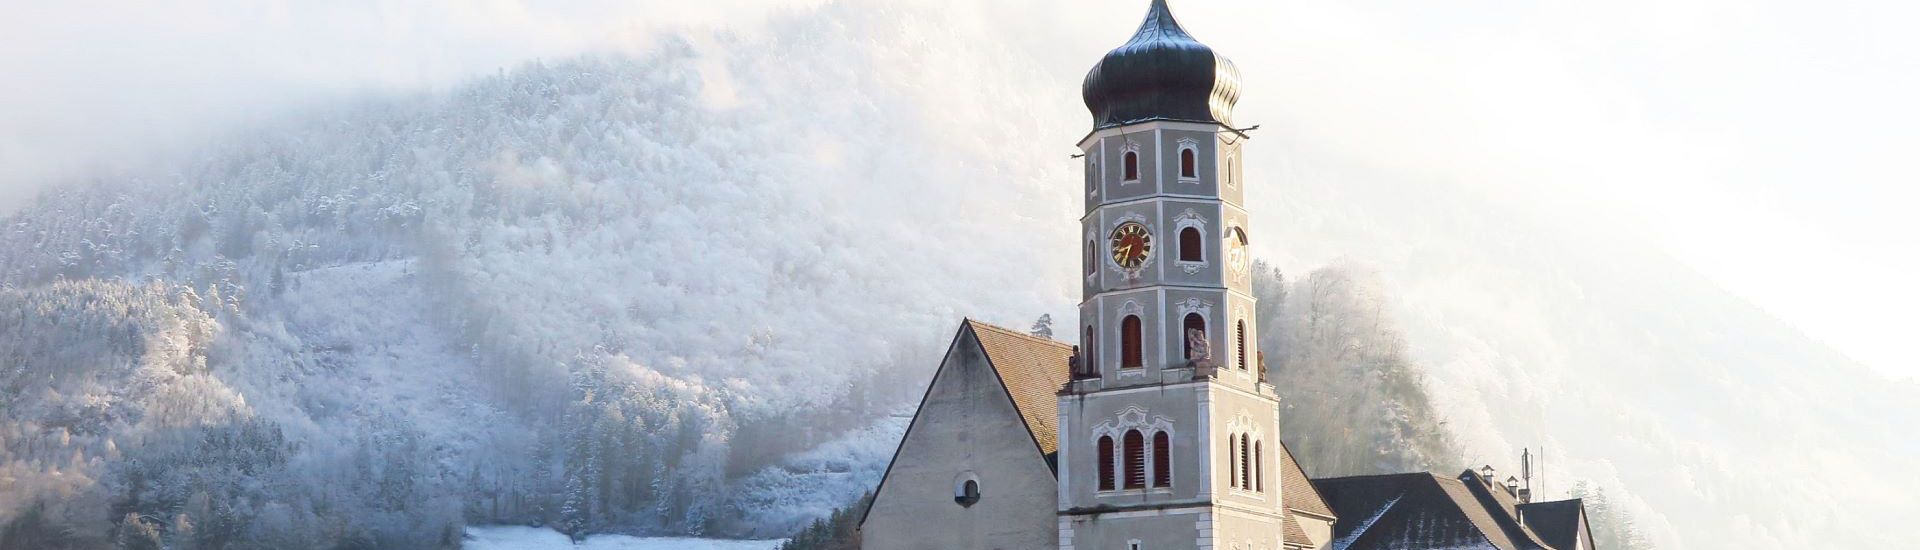 Die Grnen Vorarlberg - Bludenz - Grne Vorarlberg - comunidadelectronica.com